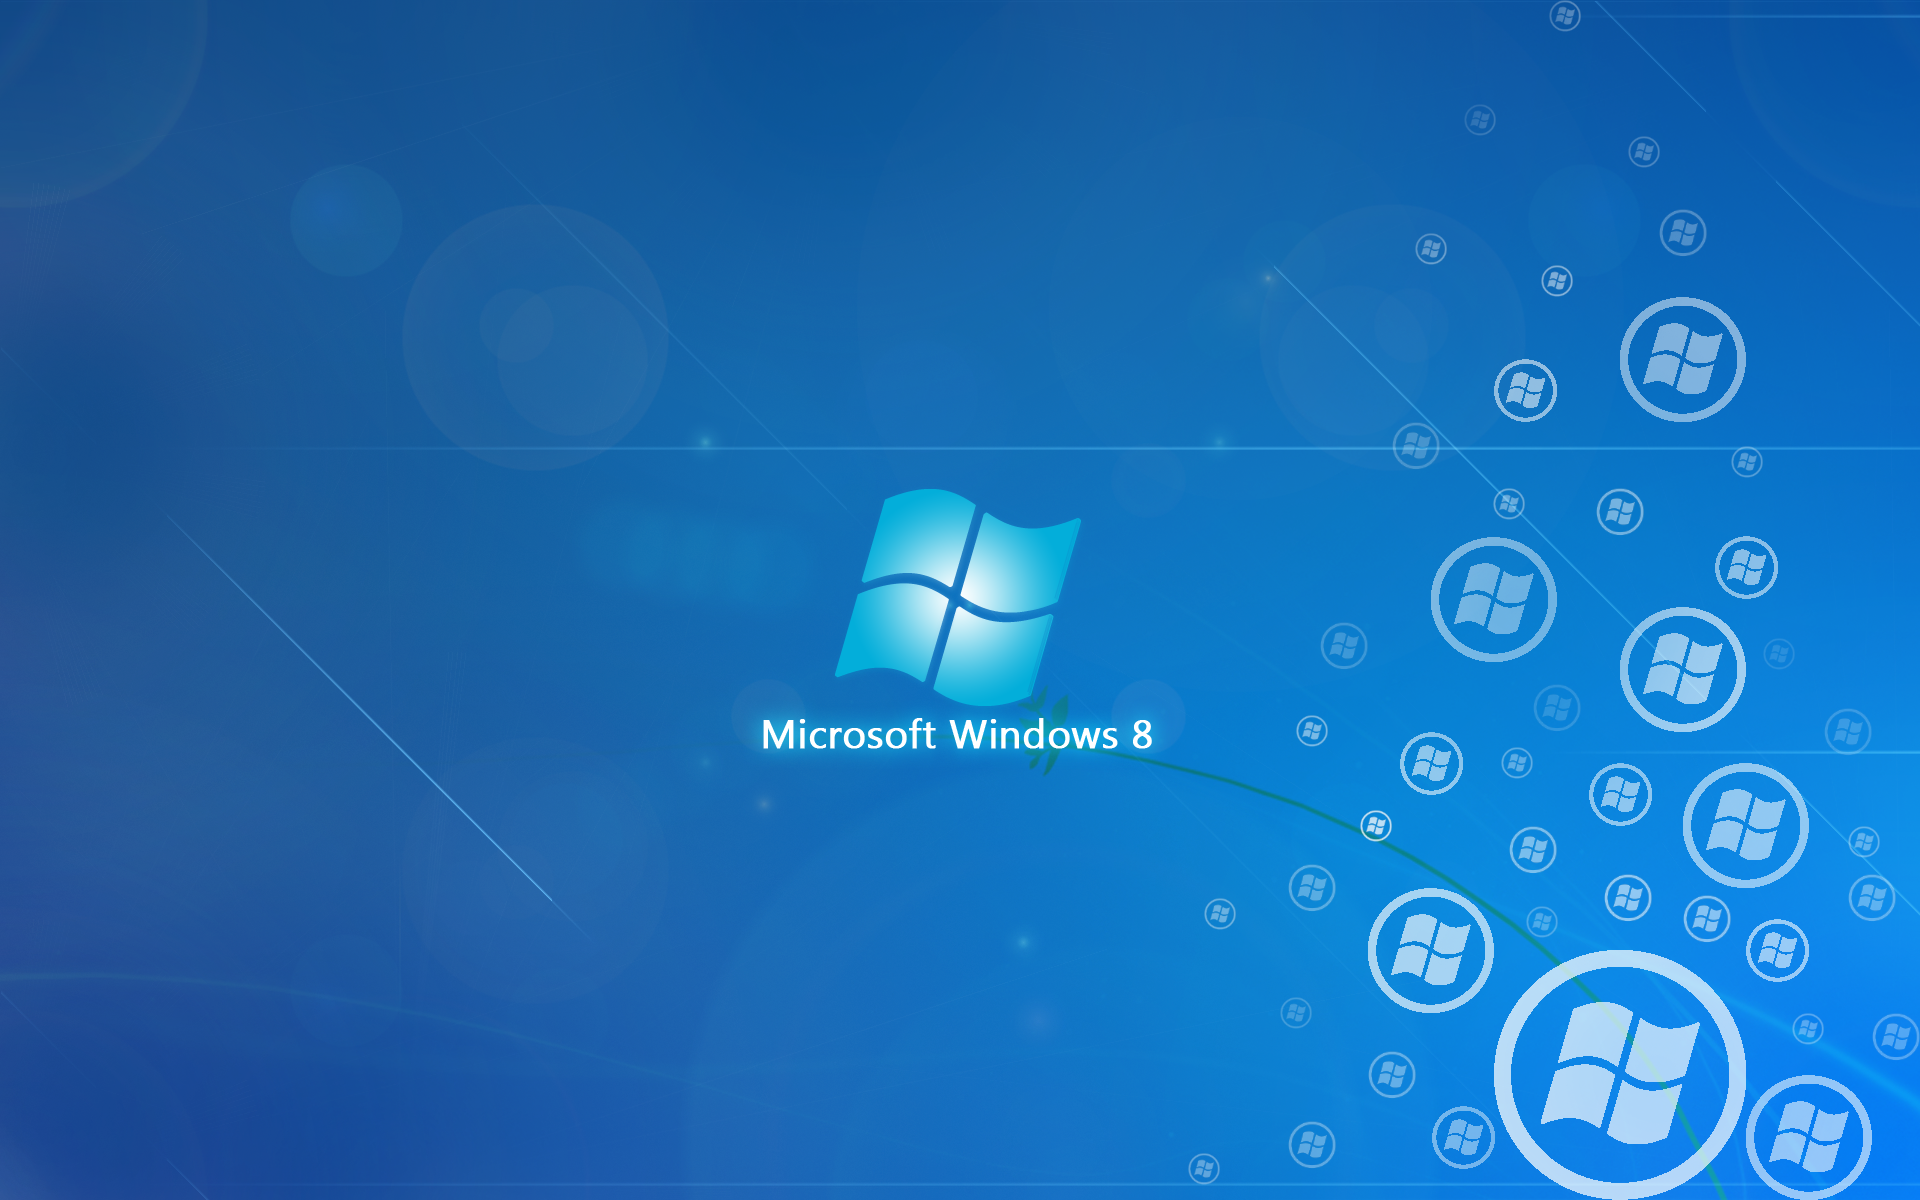 Wallpaper download microsoft - Download Microsoft Windows 8 Wallpapers Pack 1 Wallpapers Techmynd